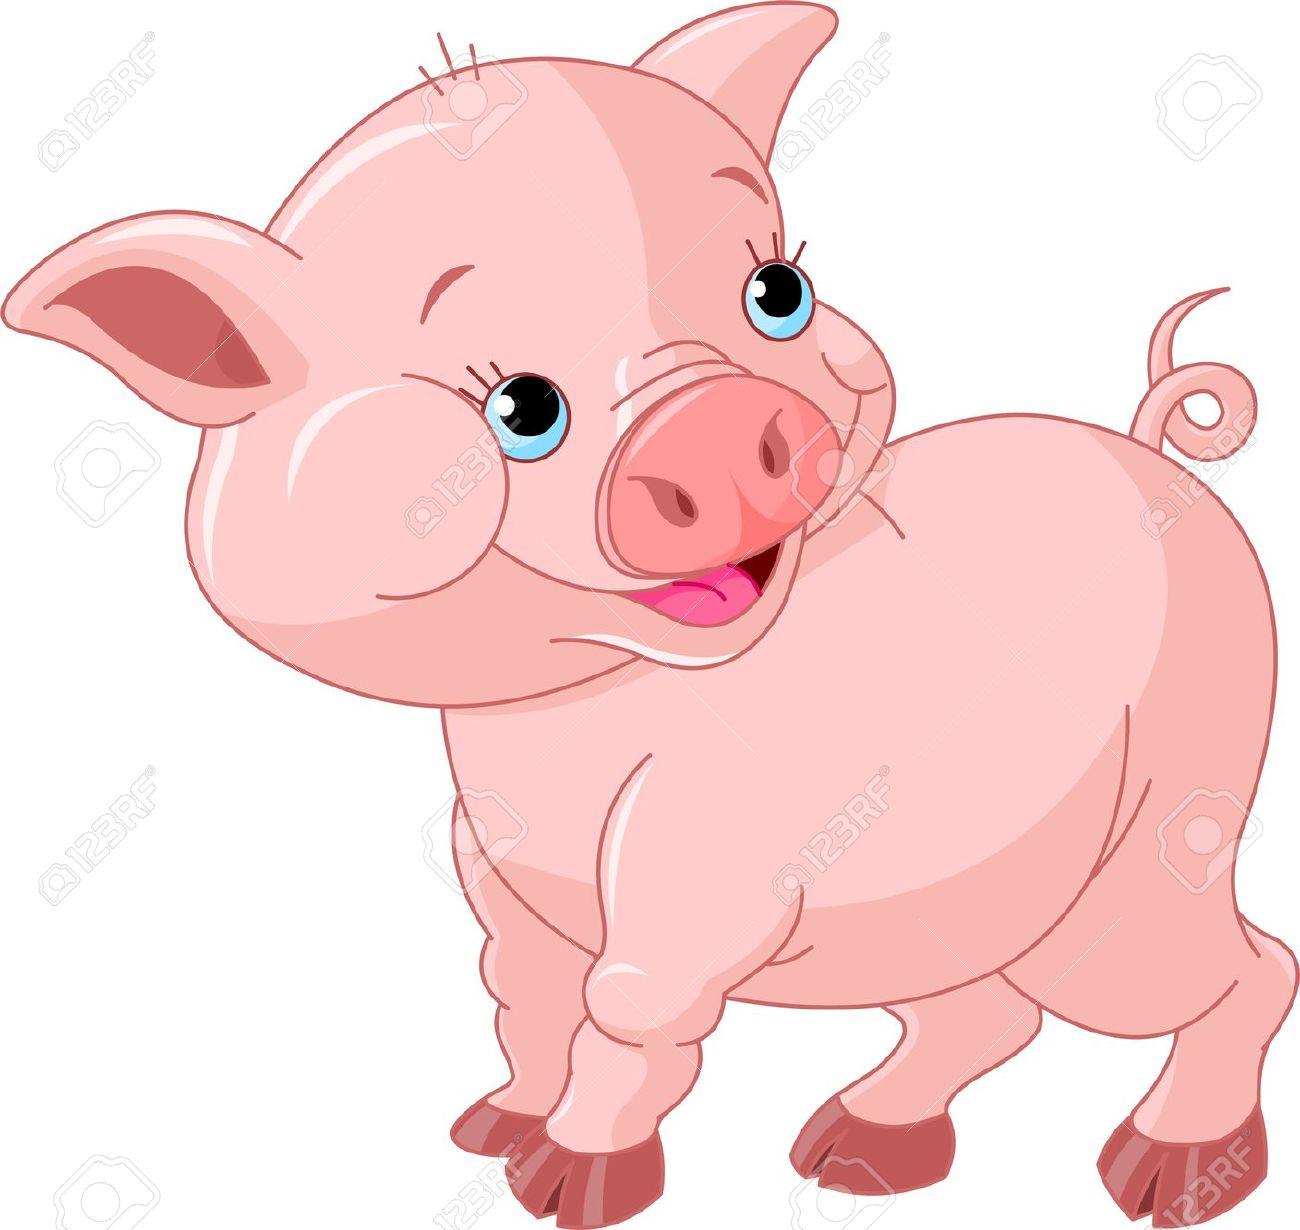 This little piggy clipart jpg transparent 10 Best images about Pigs on Pinterest | Studios, Pigs and Textiles jpg transparent